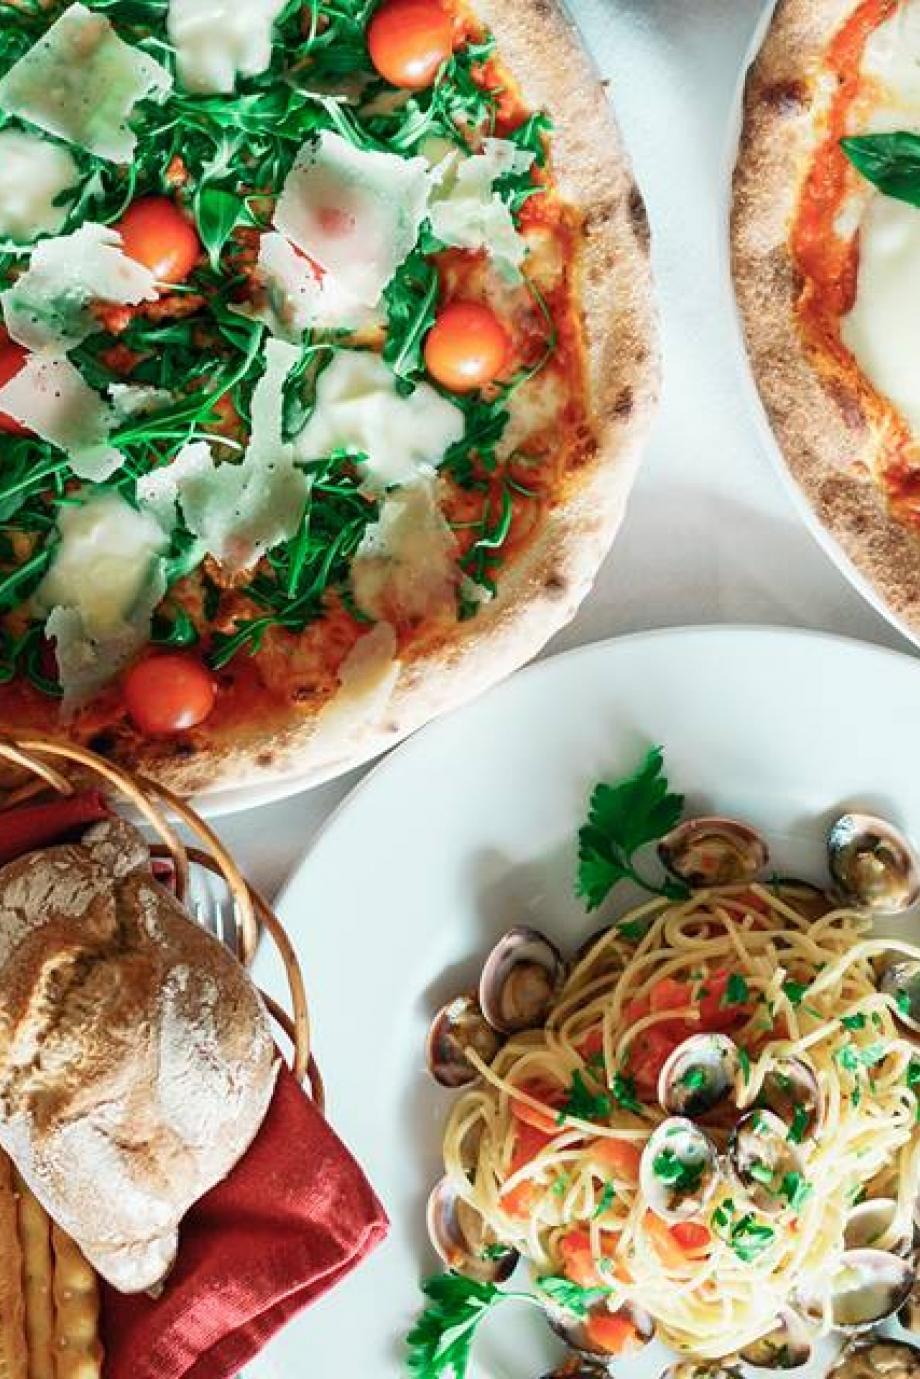 LisboaCool_Blog_A pizza ilimitada está de volta (para sempre!)